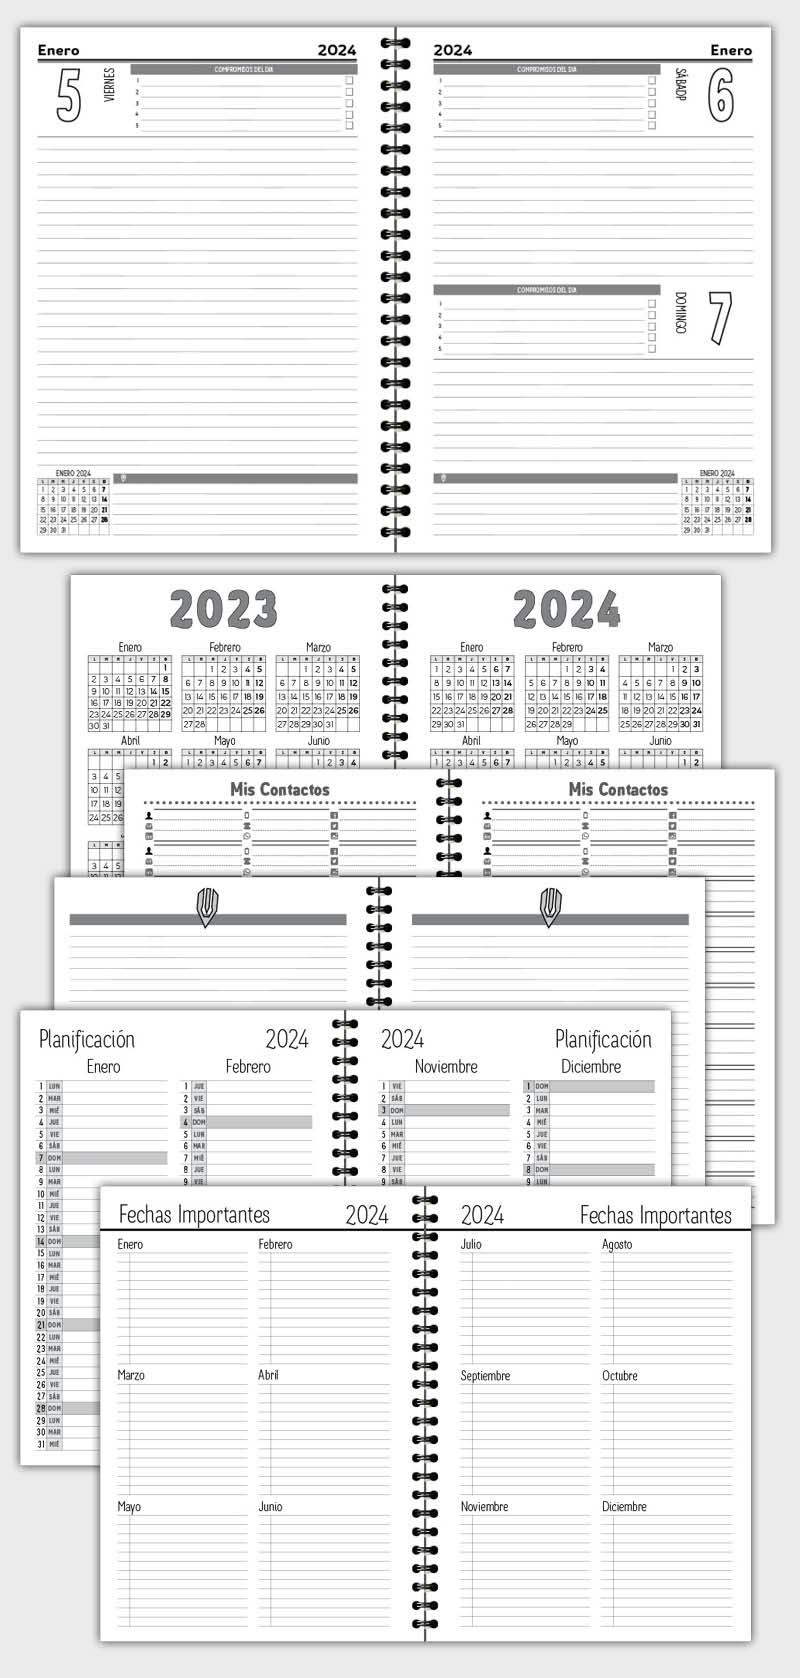 AGENDA DIARIA PARA 2019 EN ARCHIVO DE PLANTILLA MODELO ATD14